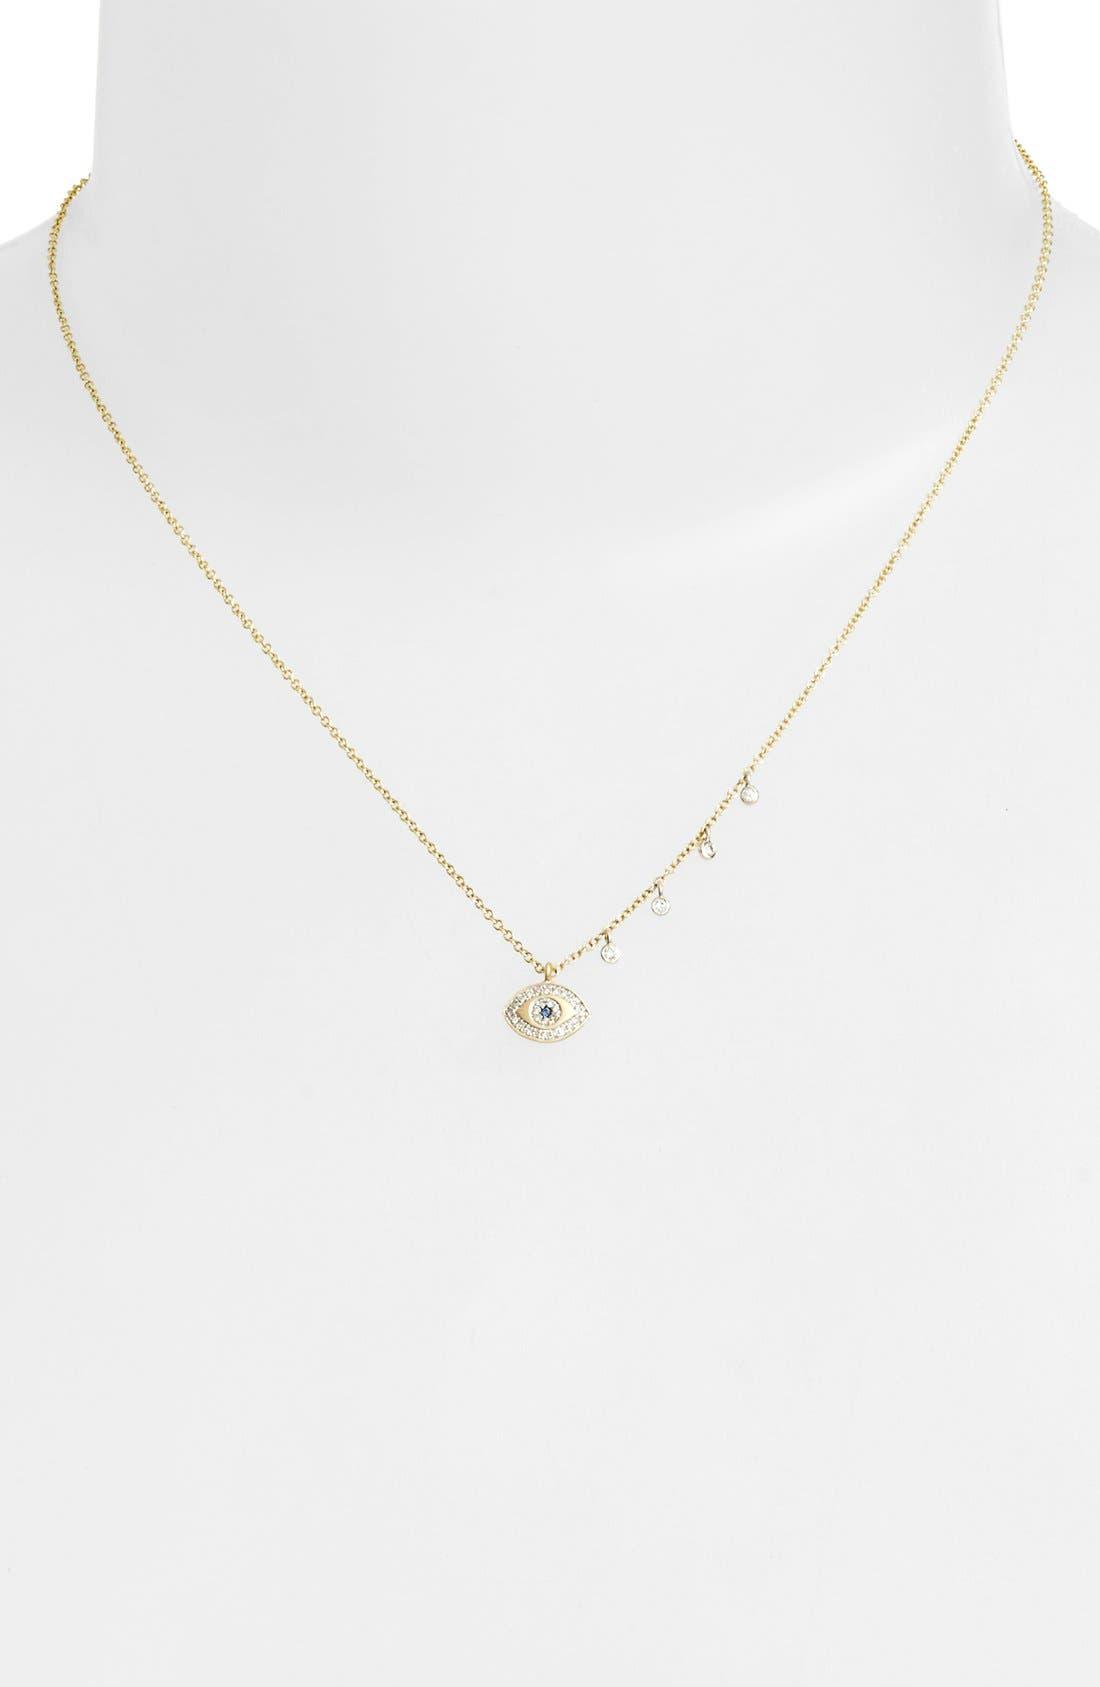 Evil Eye Diamond Pendant Necklace,                             Alternate thumbnail 2, color,                             YELLOW GOLD